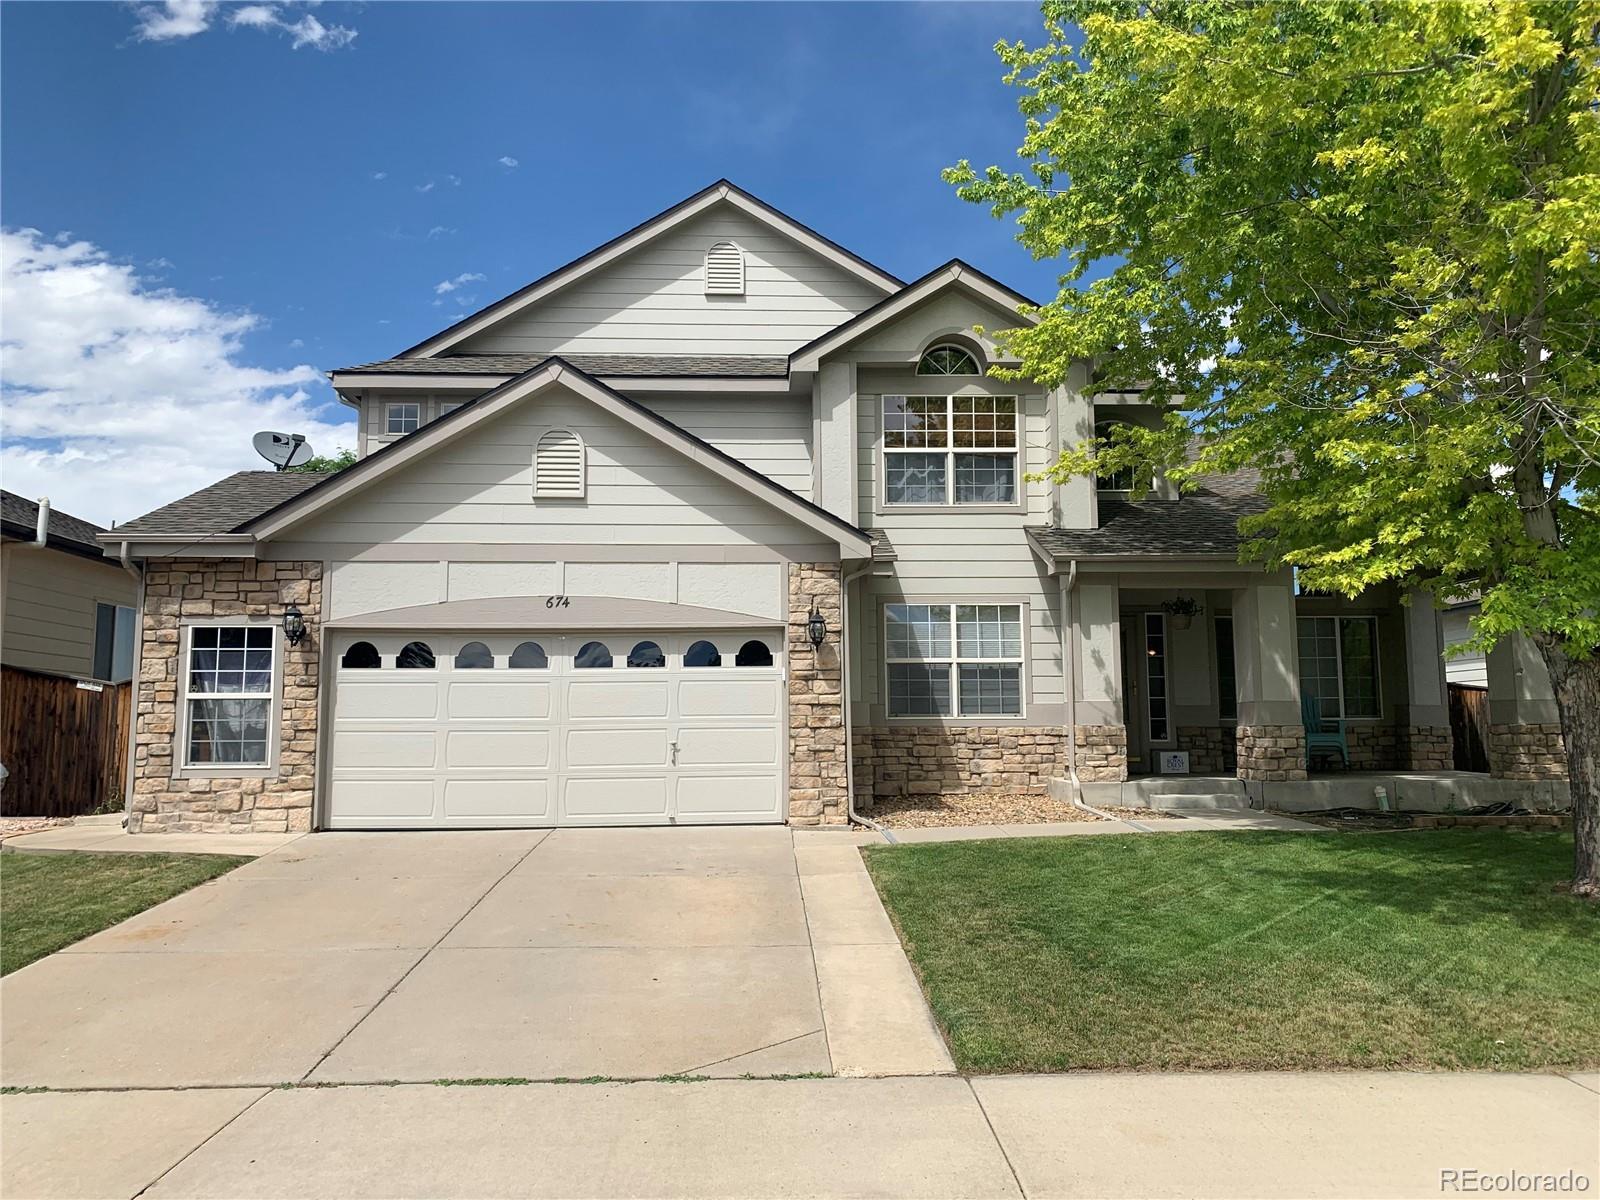 674 Clarendon Drive Property Photo - Longmont, CO real estate listing